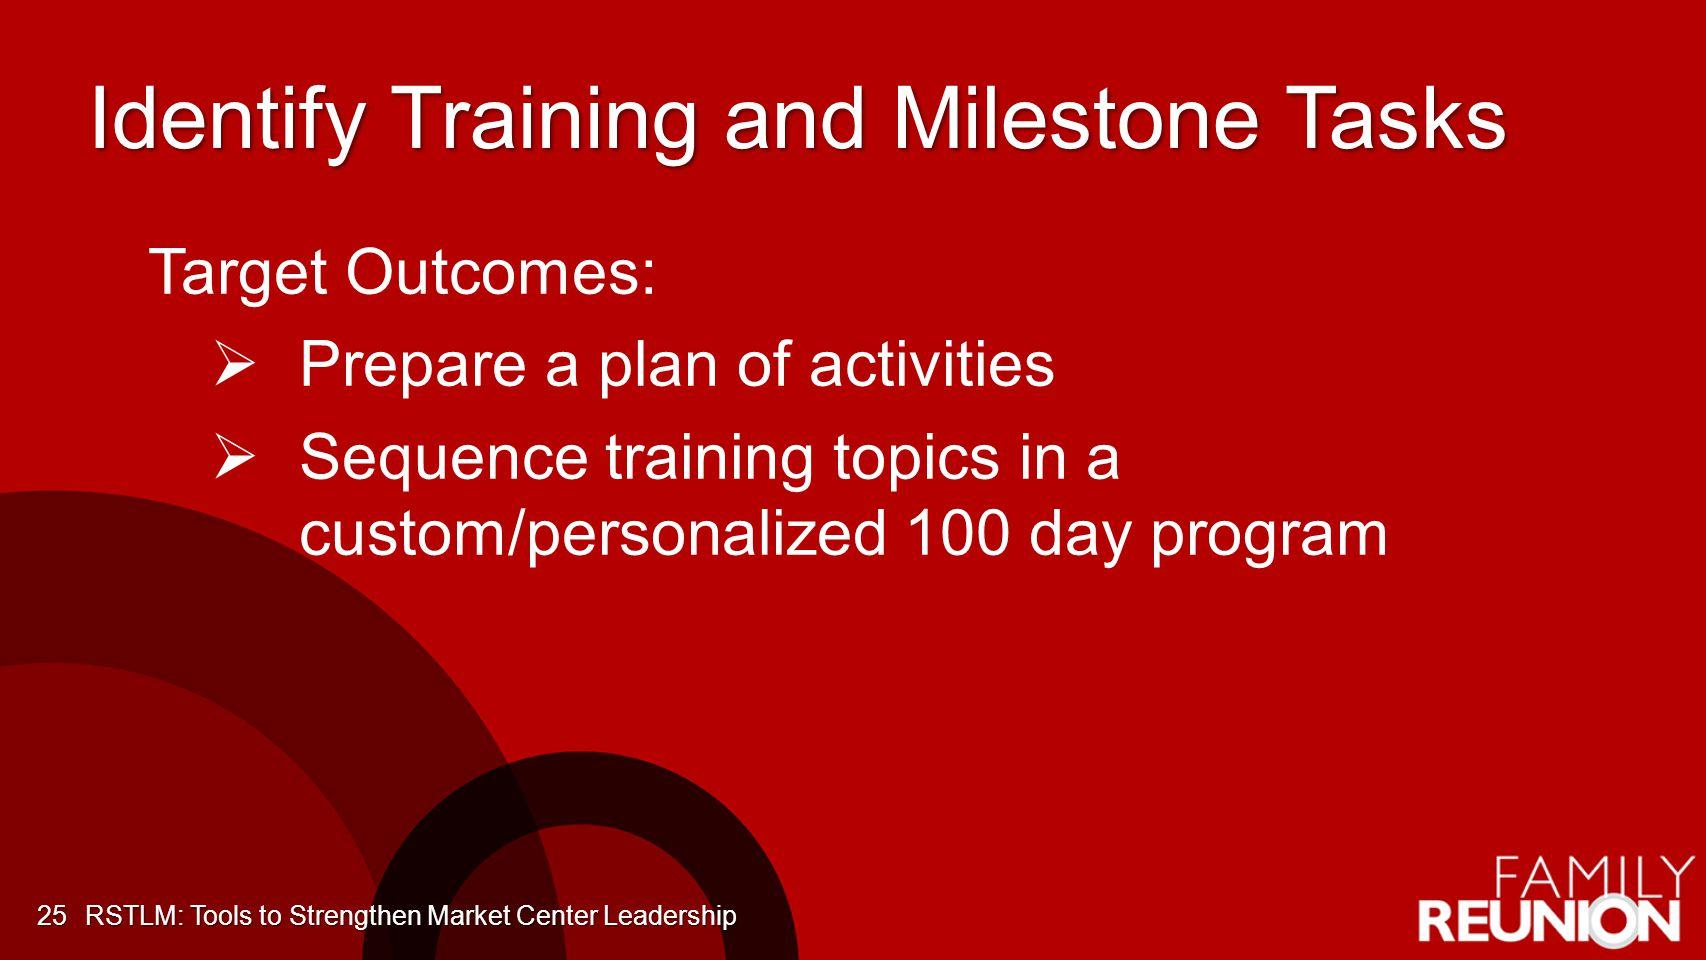 Identify Training and Milestone Tasks